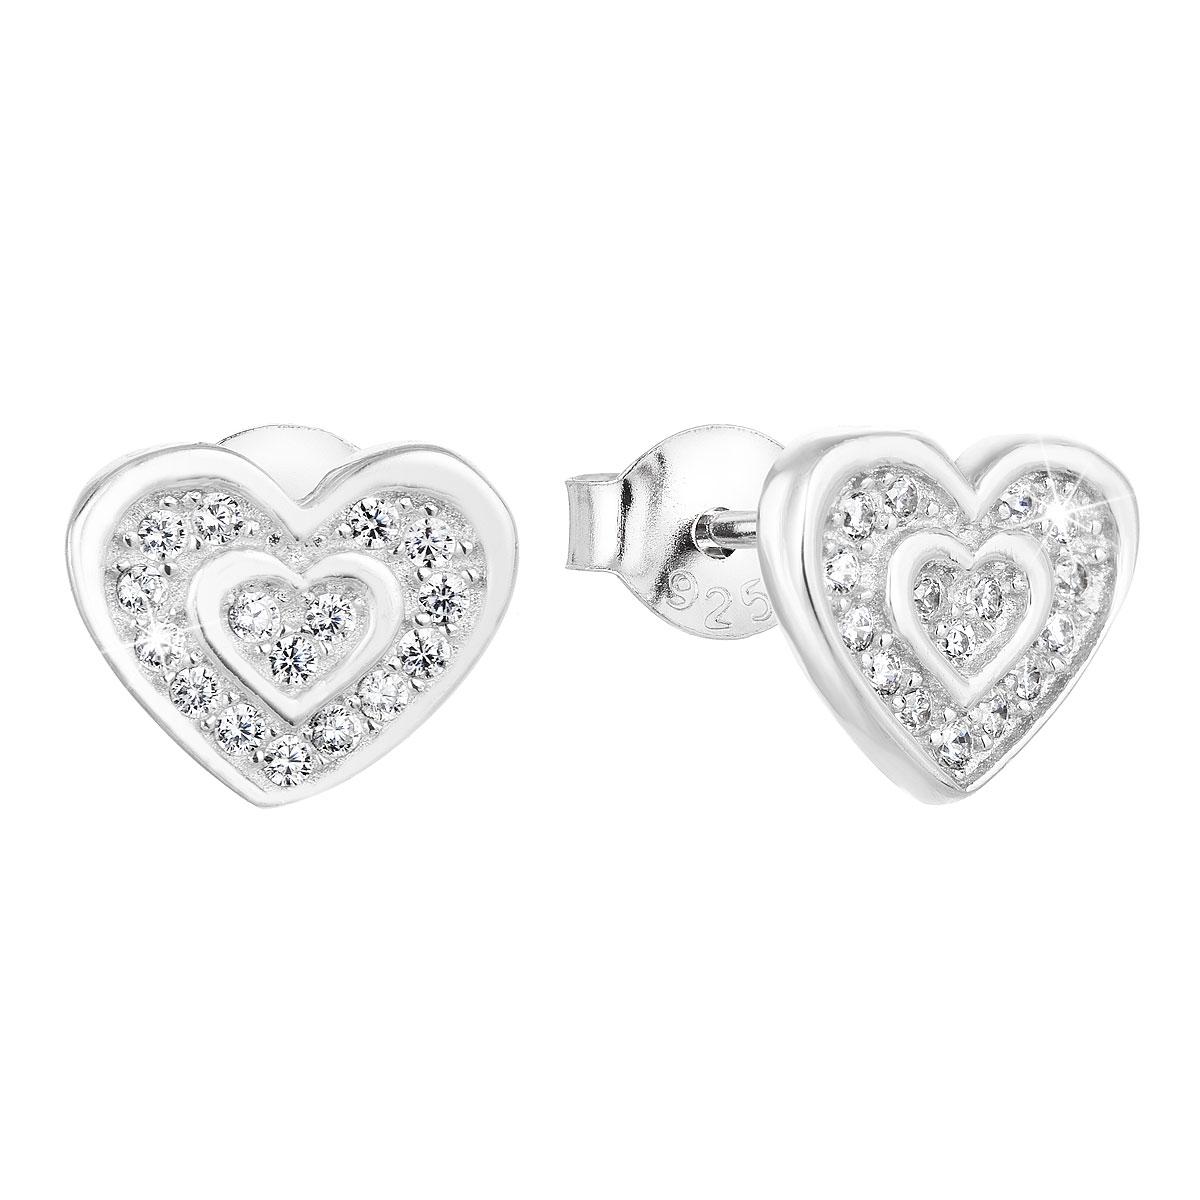 Strieborné náušnice perličky so zirkónom biele srdce 11025.1